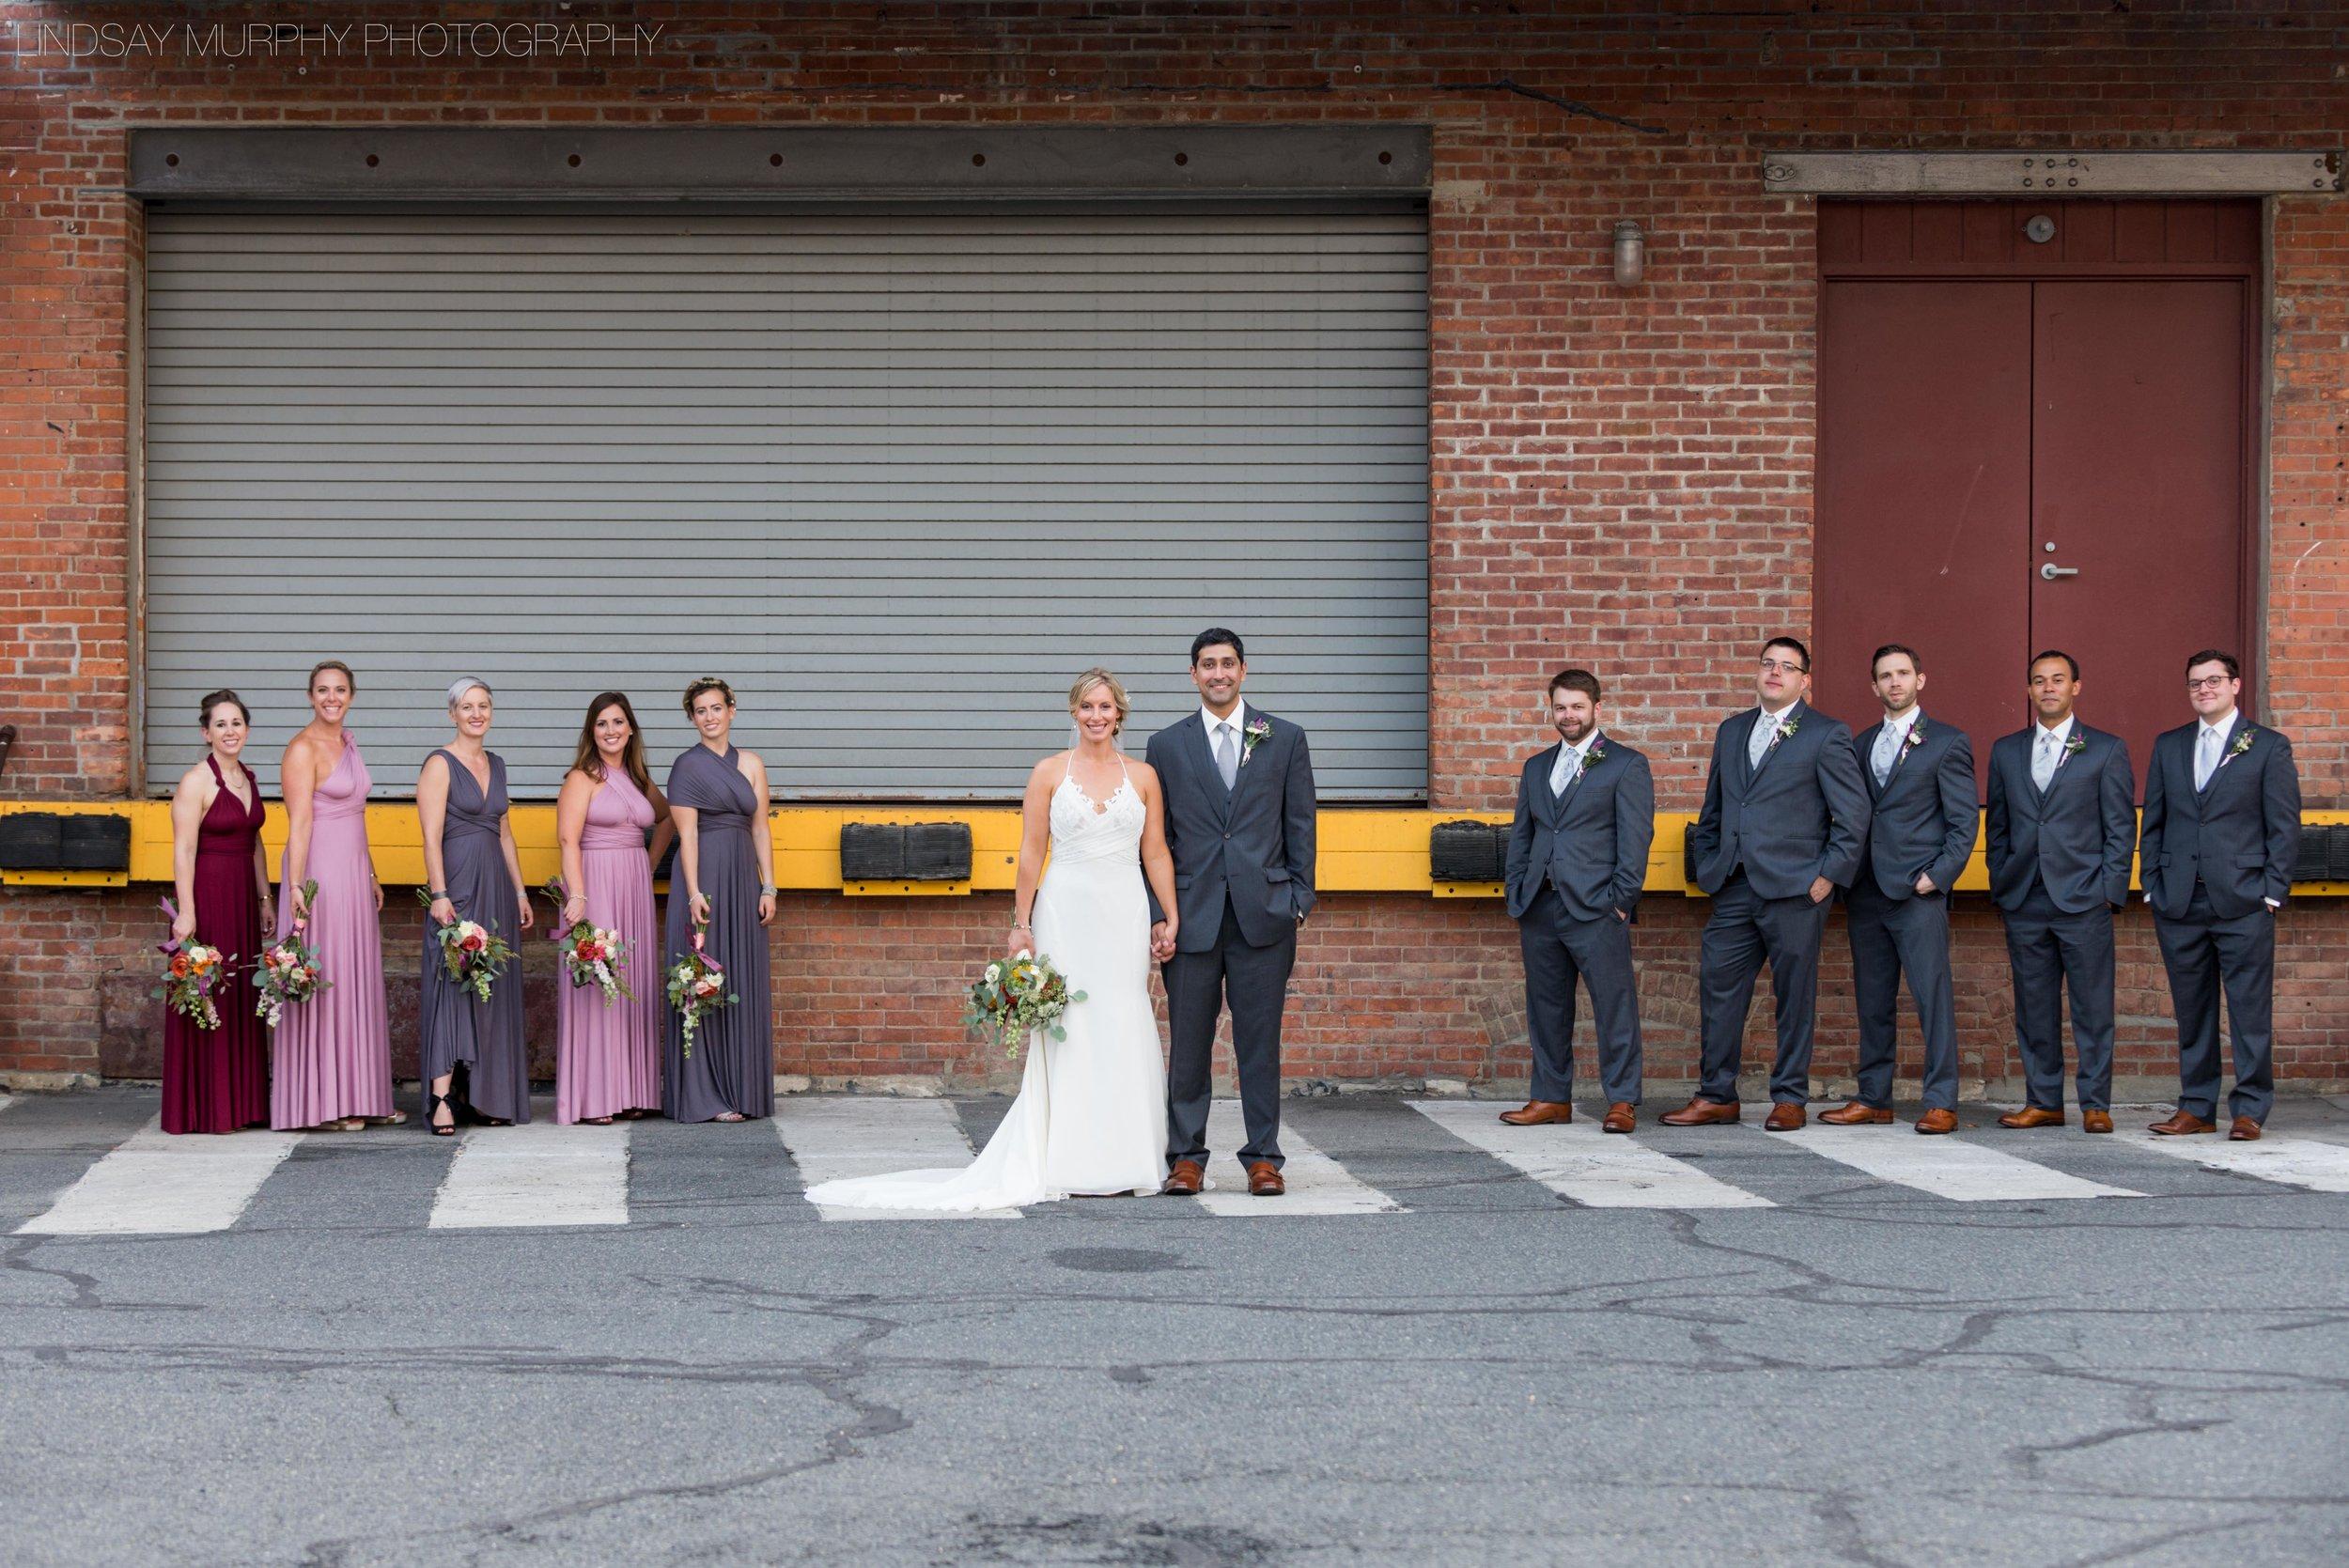 New_England_wedding-22.jpg